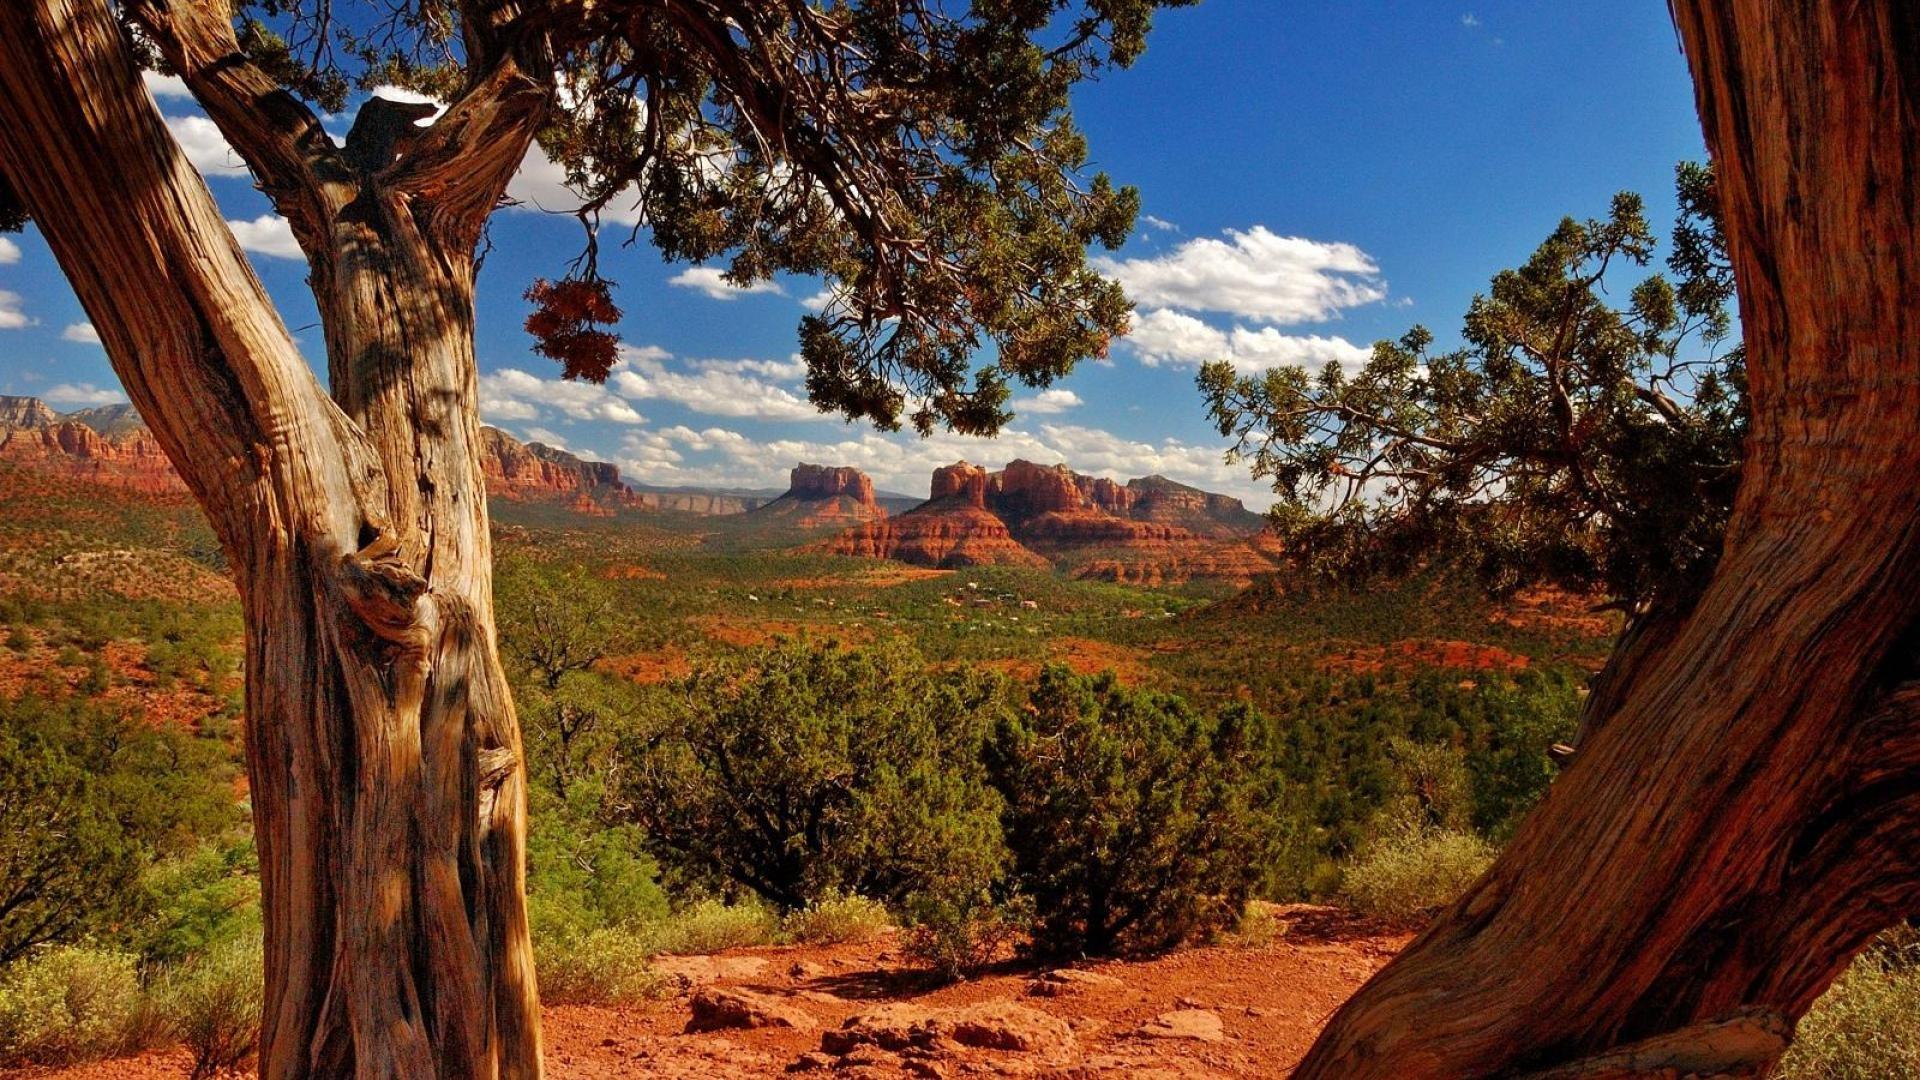 Arizona Desert Wallpaper HD (40+ Images